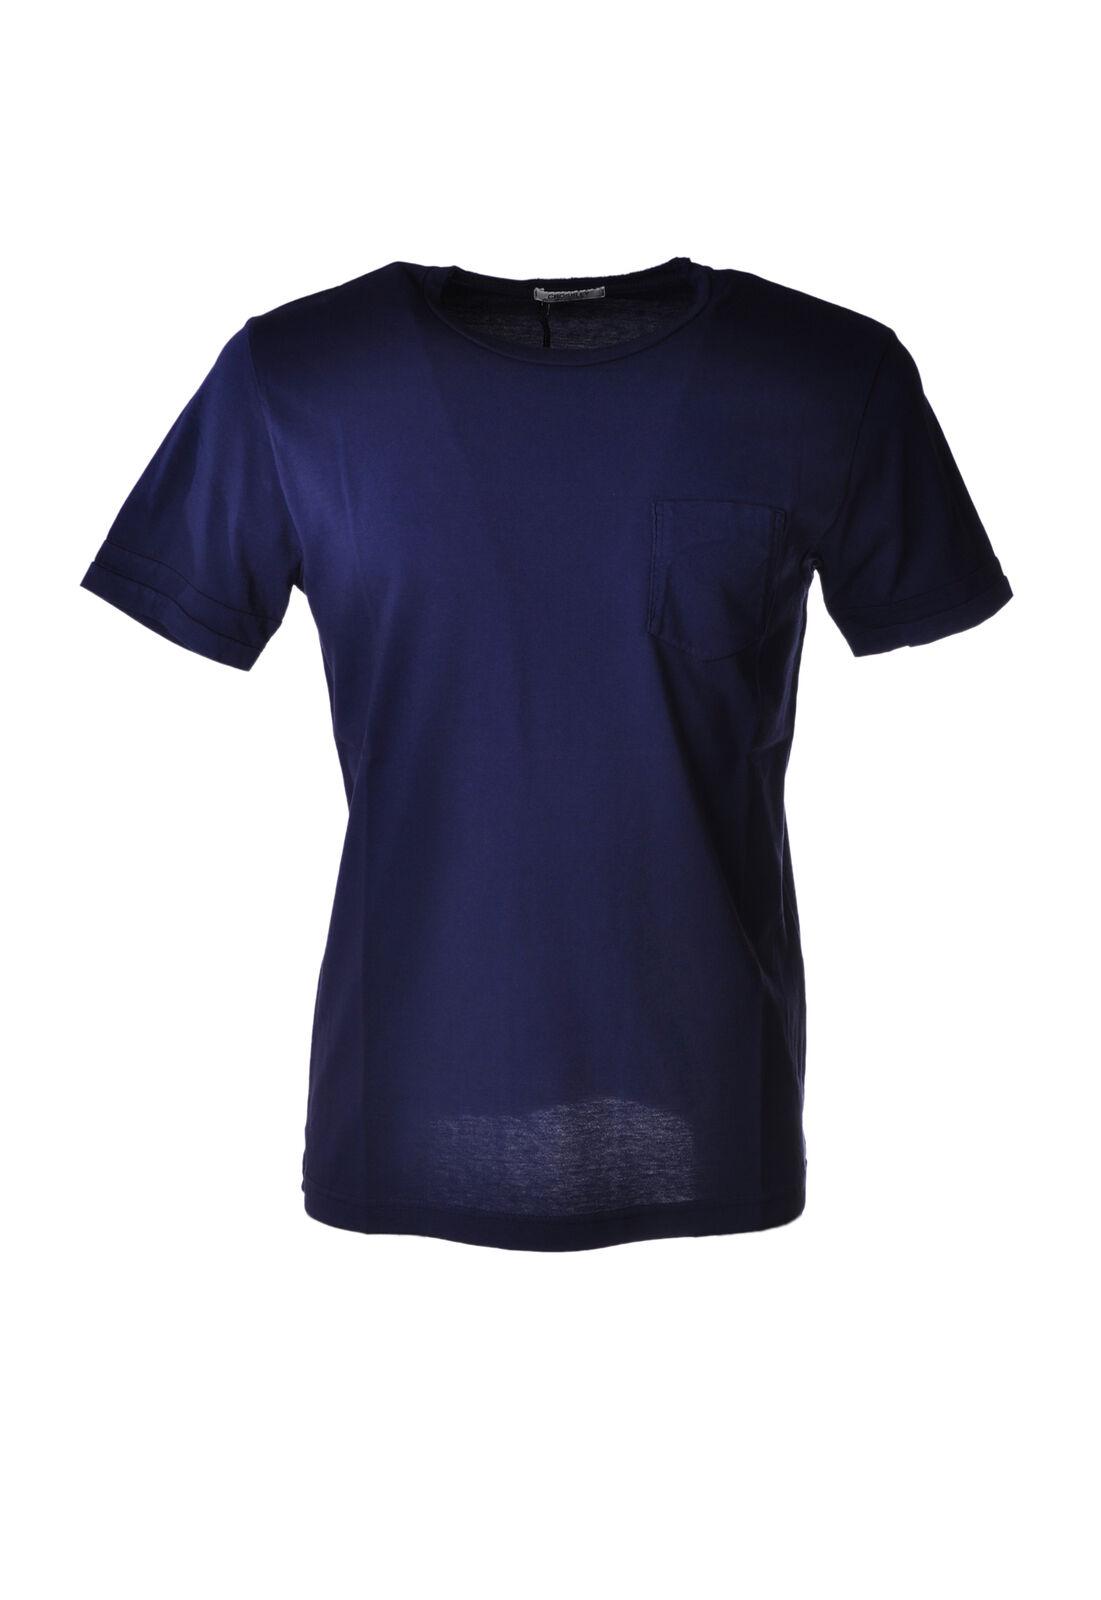 CROSSLEY - Topwear-T-shirts - Man - bluee - 5021418G184335